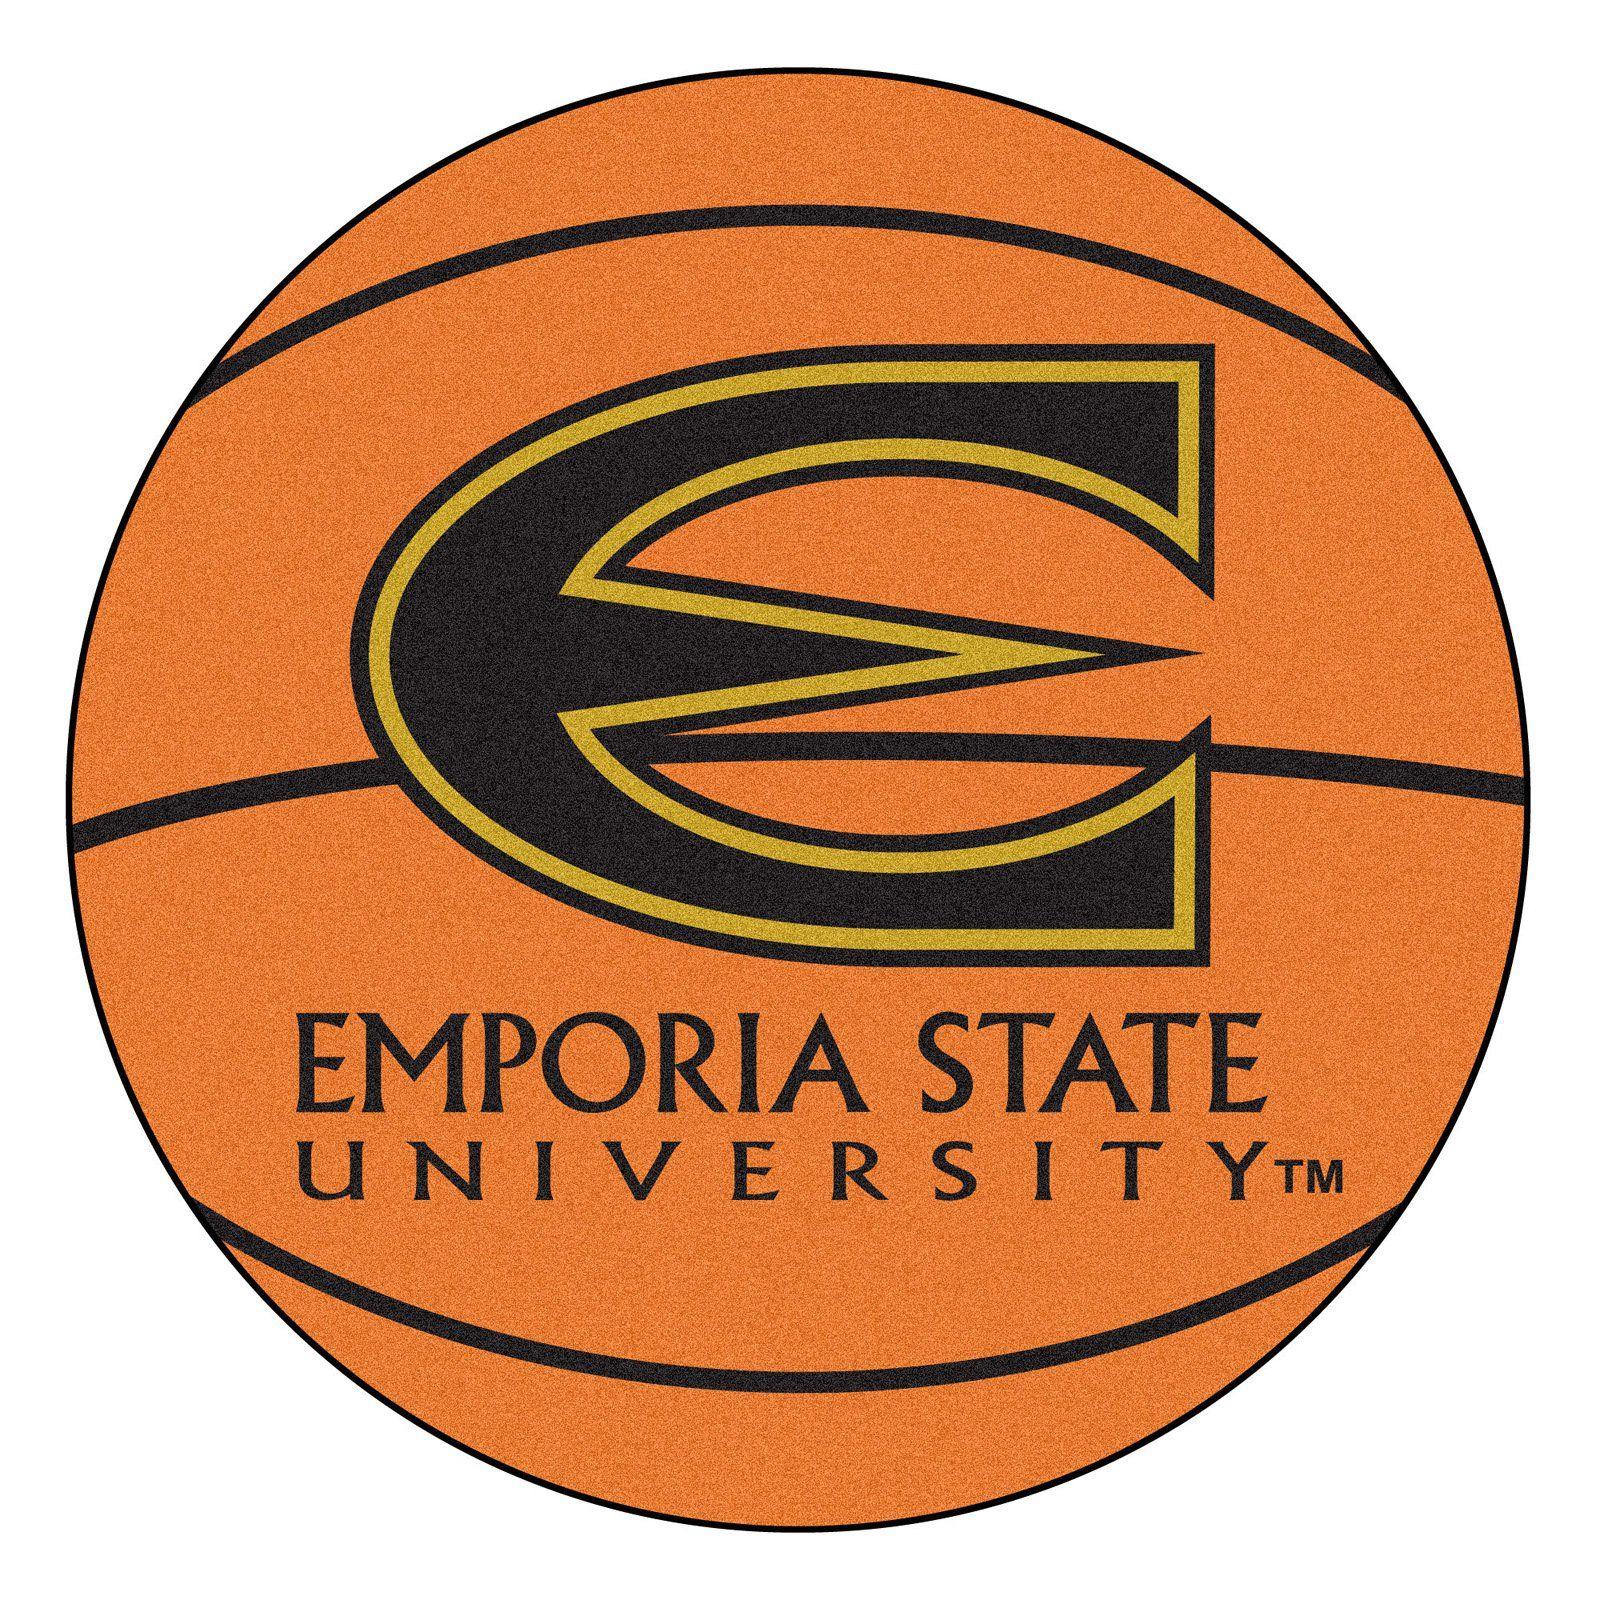 Fan Mats NCAA Collegiate Round Basketball Rug 2.25 diam